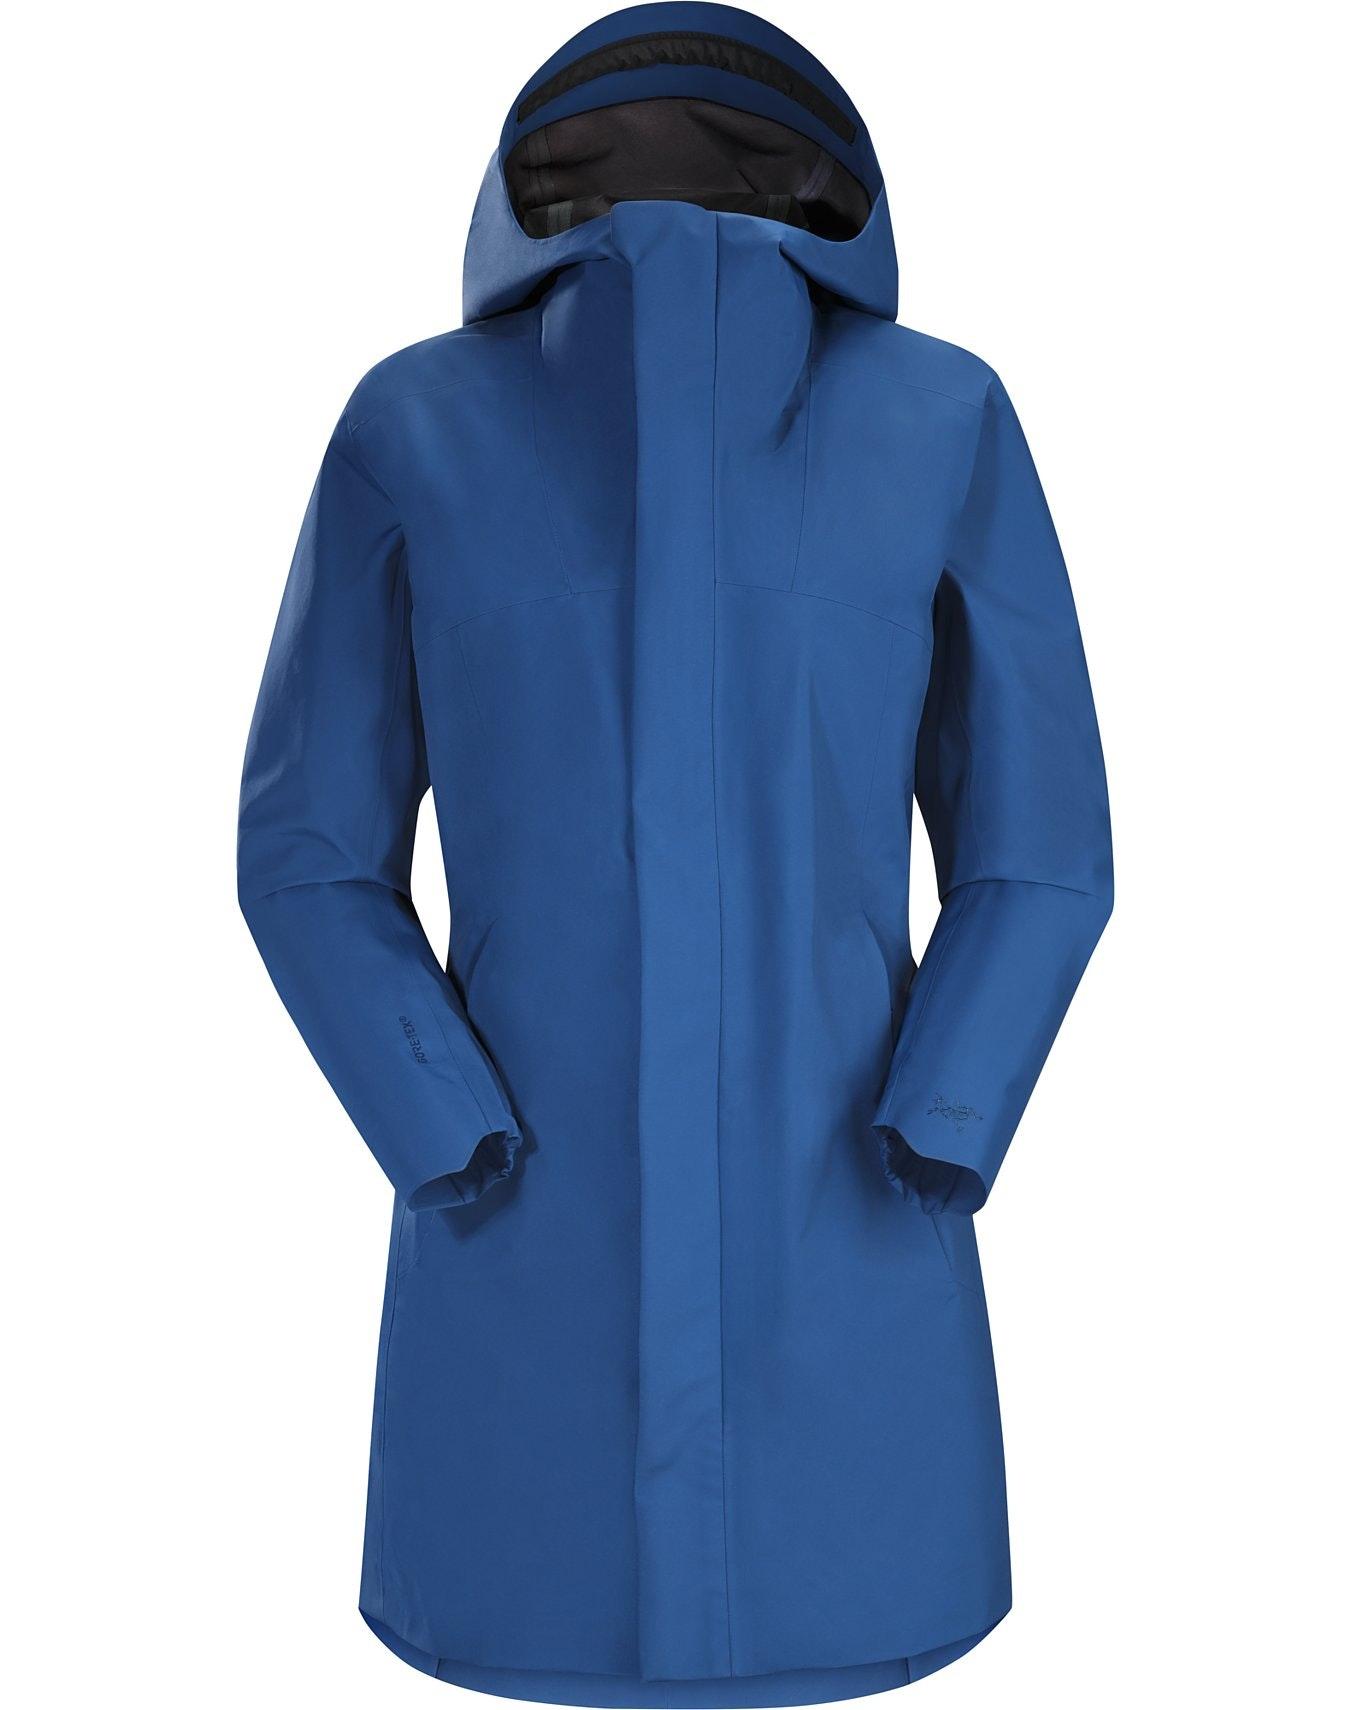 Codetta Coat / Womens / Arc'teryx